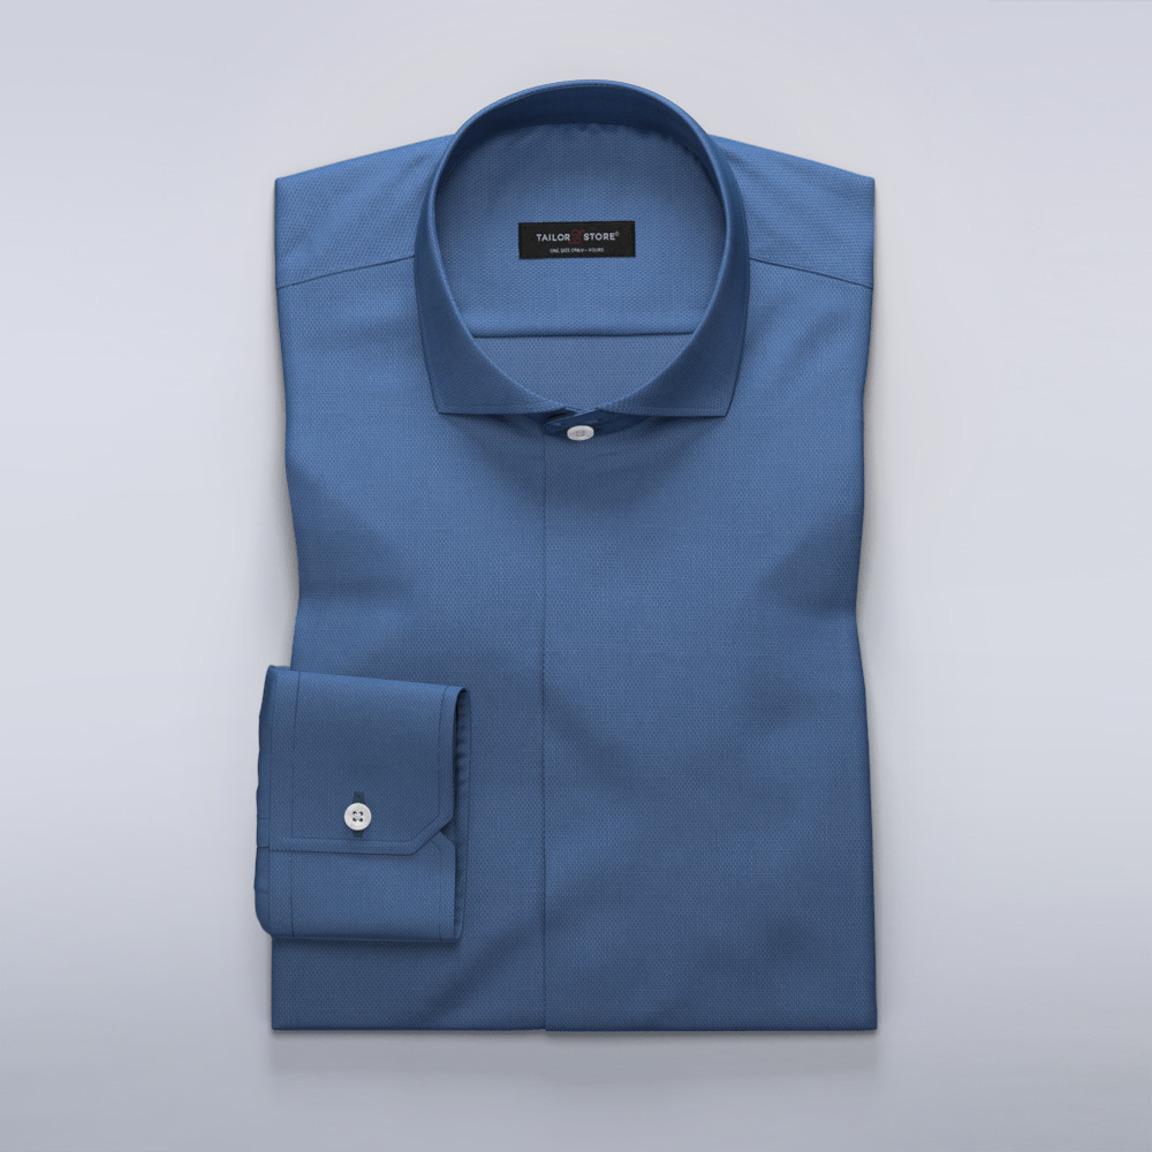 Medium-blaues, gemustertes Hemd